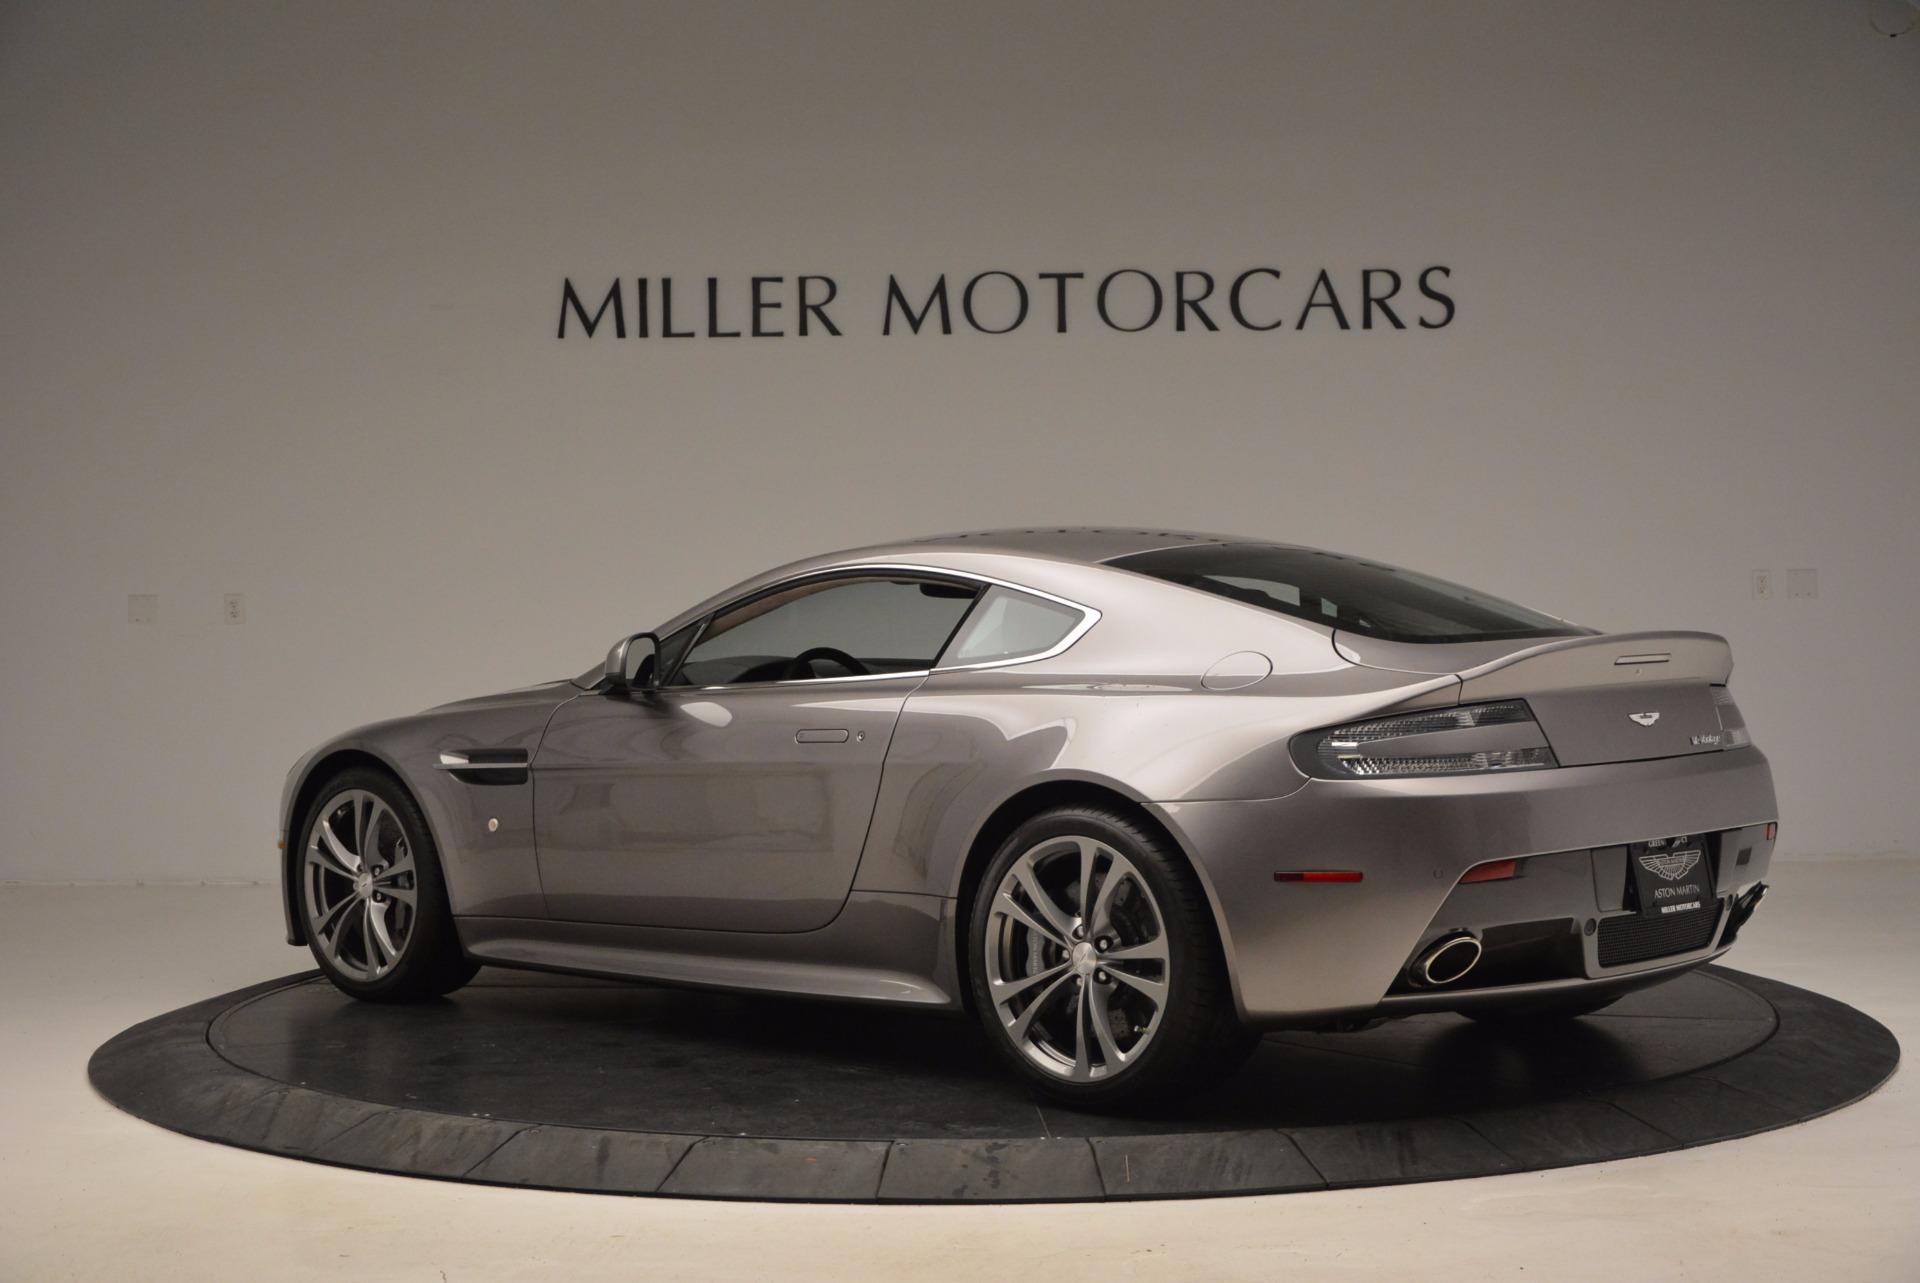 Used 2012 Aston Martin V12 Vantage  For Sale In Greenwich, CT 994_p4